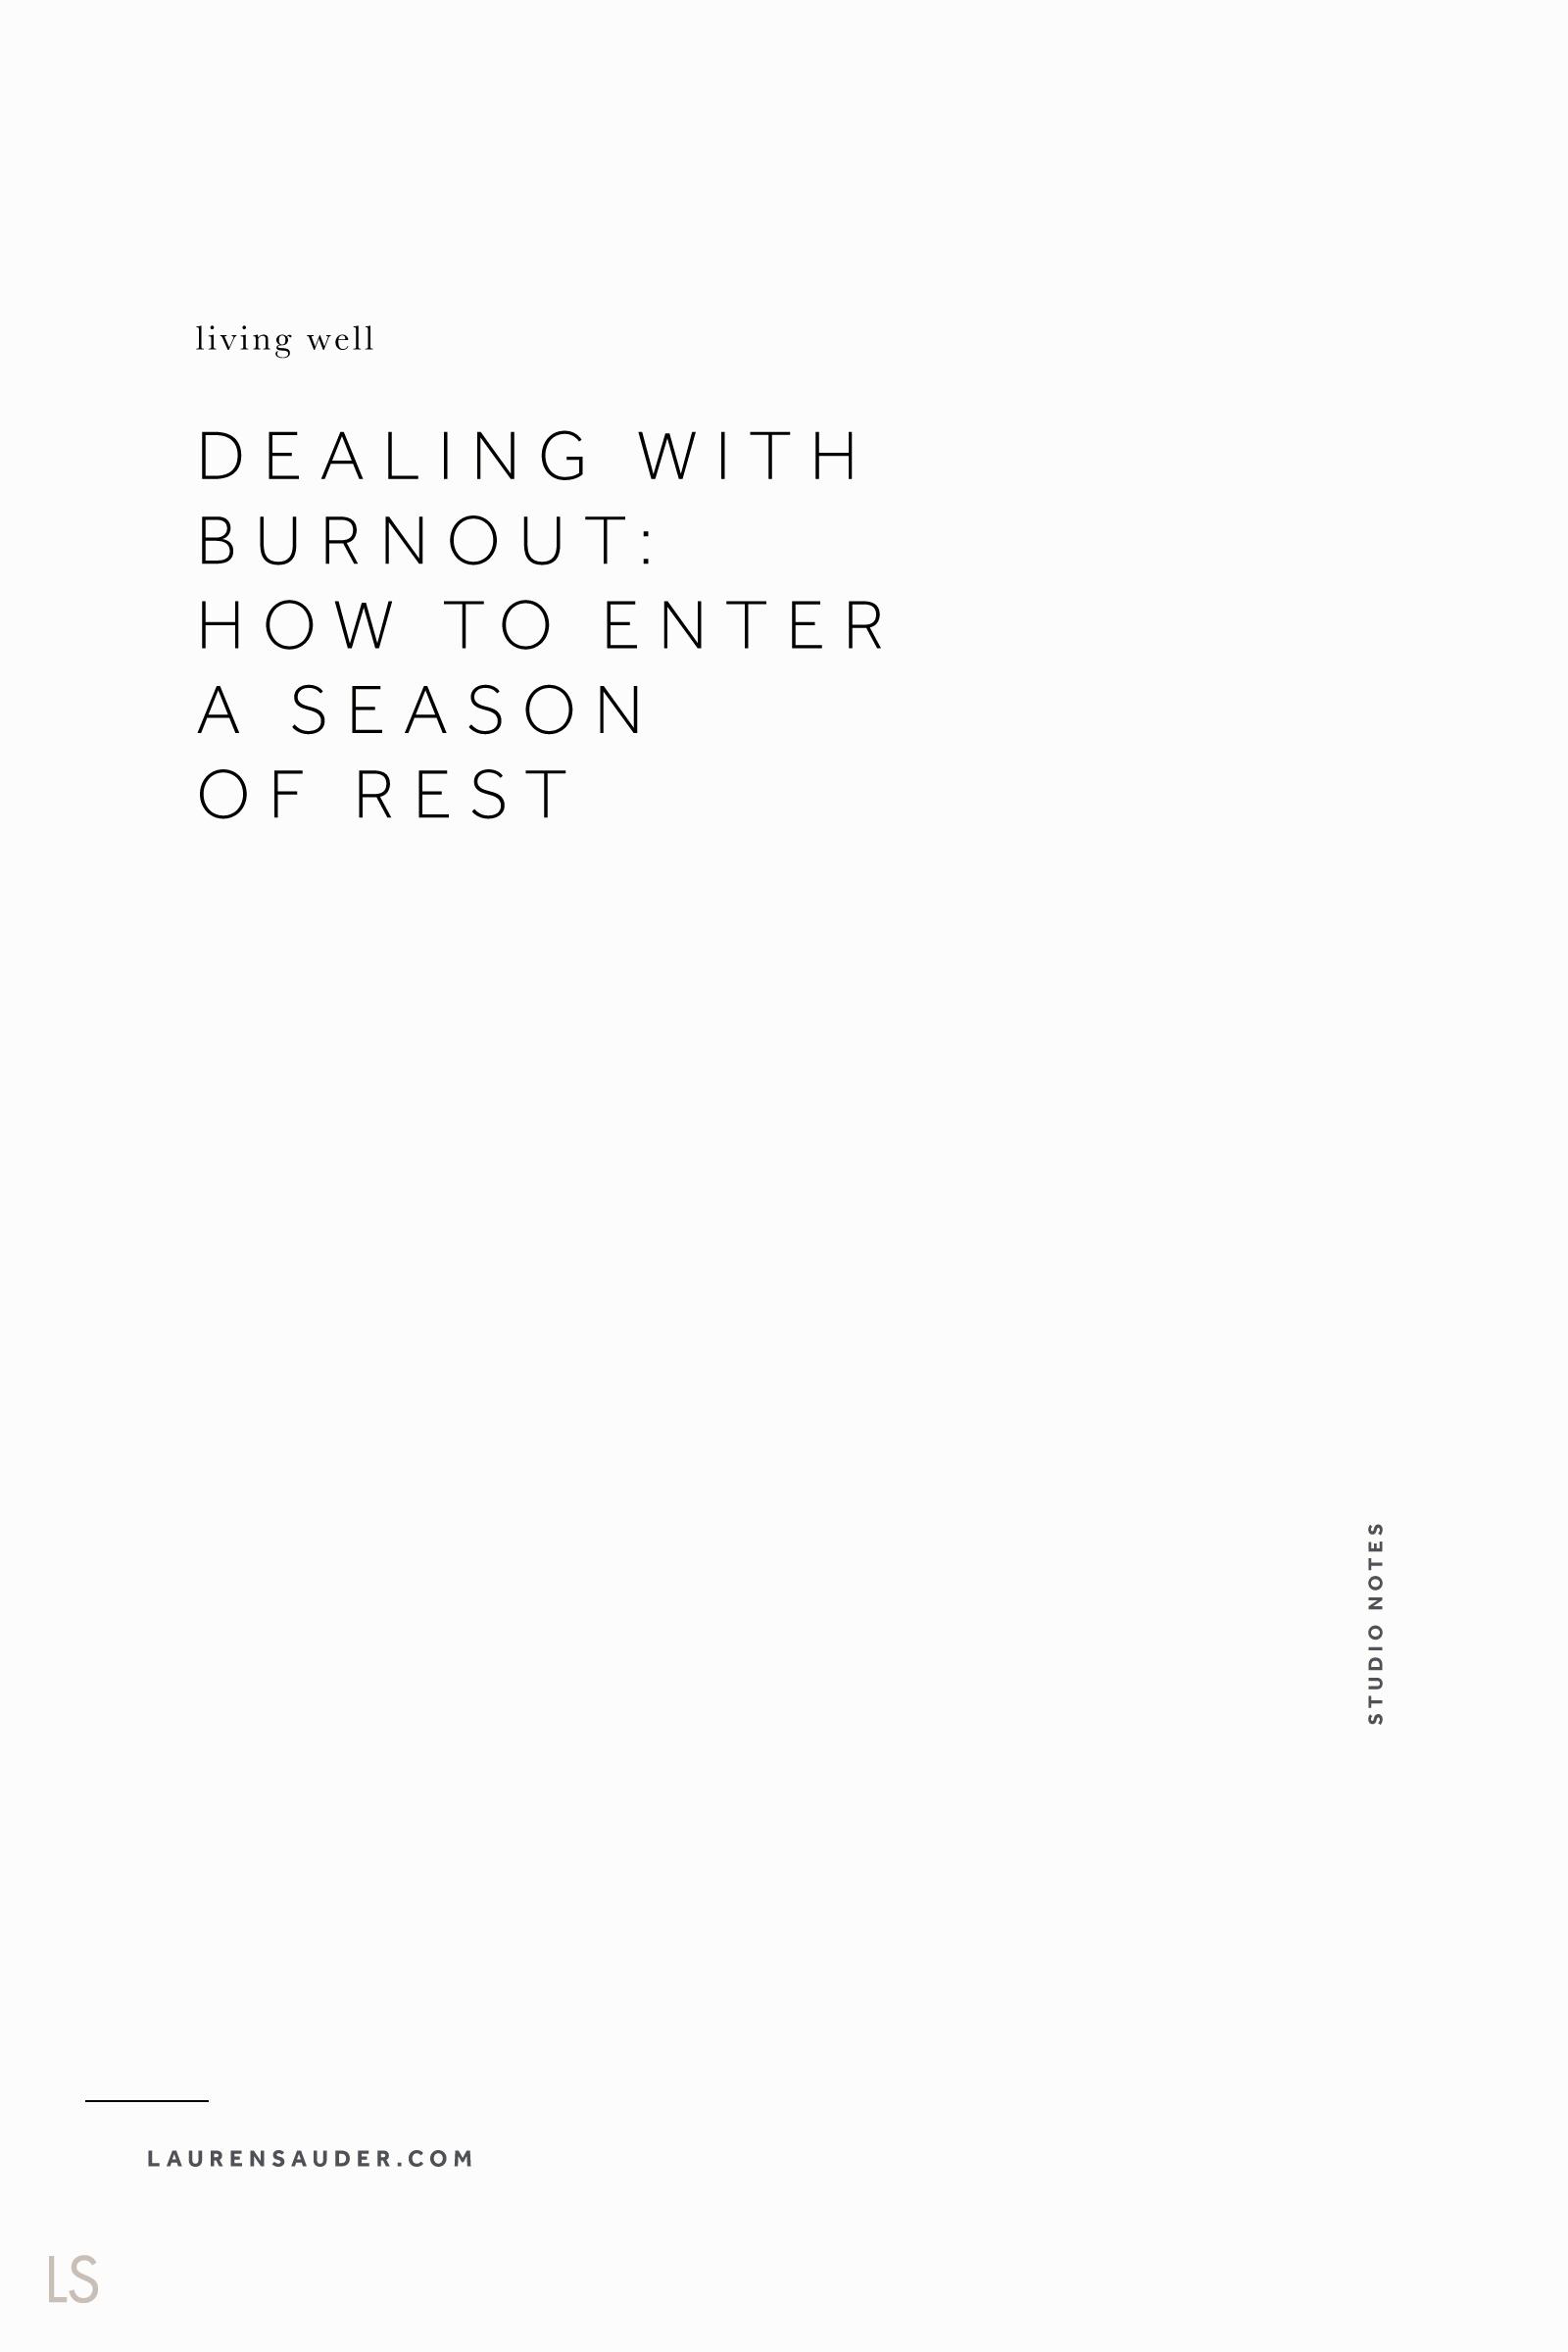 Dealing with Burnout: How to Enter a Season of Rest - Lauren Sauder #burnout #rest artist studio, creative entrepreneur, studio musings, season of rest, new year, new beginnings, goals